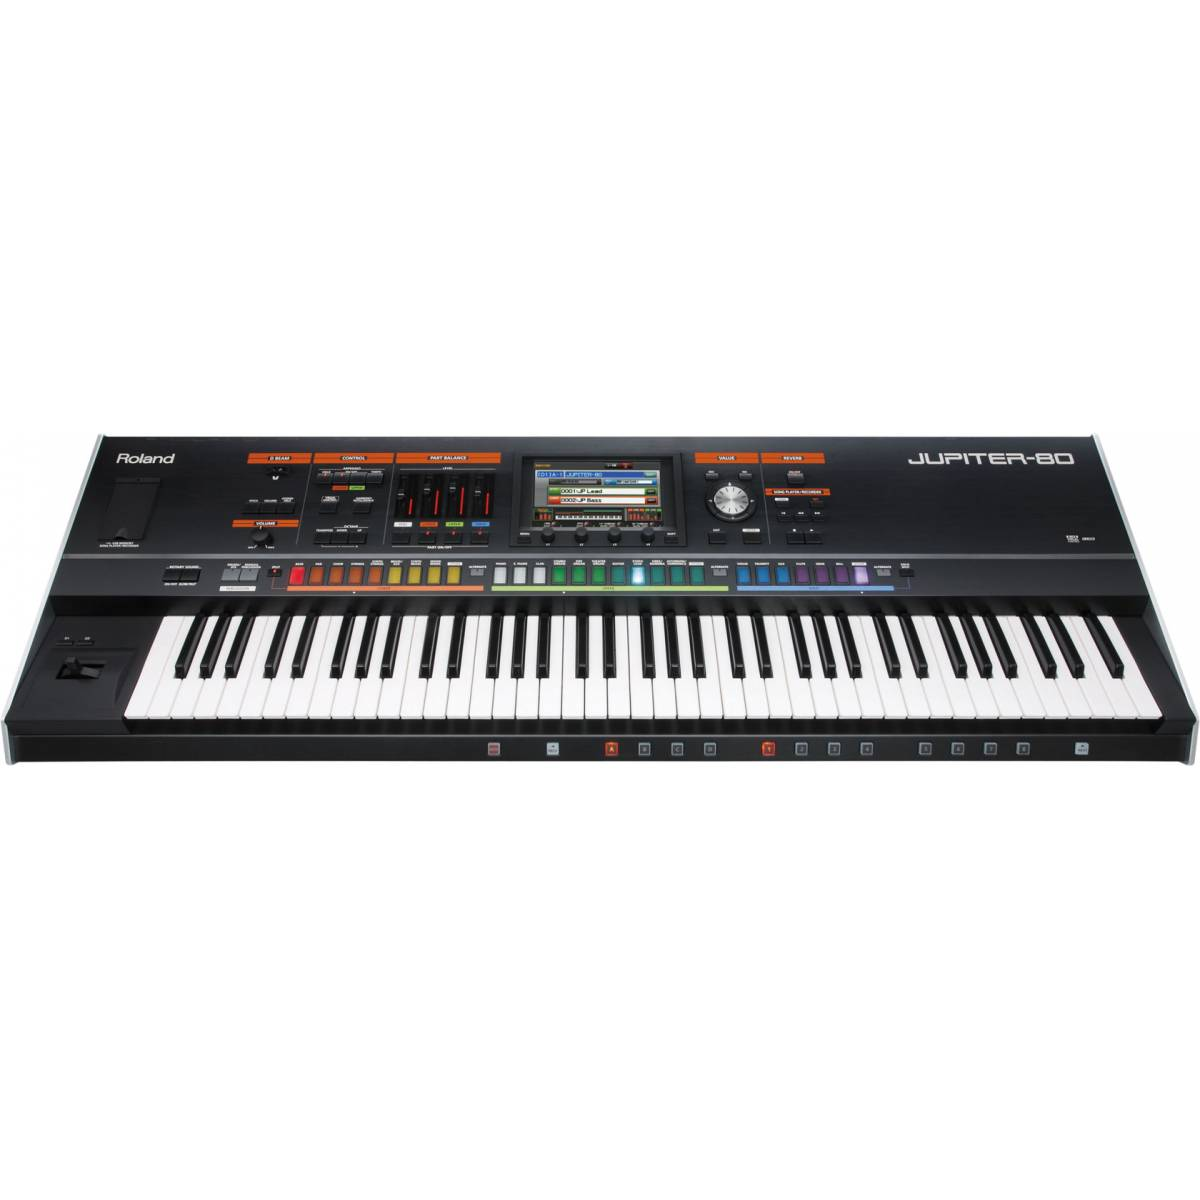 roland jupiter 80 synthesizer 76 key midi keyboard from inta audio uk. Black Bedroom Furniture Sets. Home Design Ideas